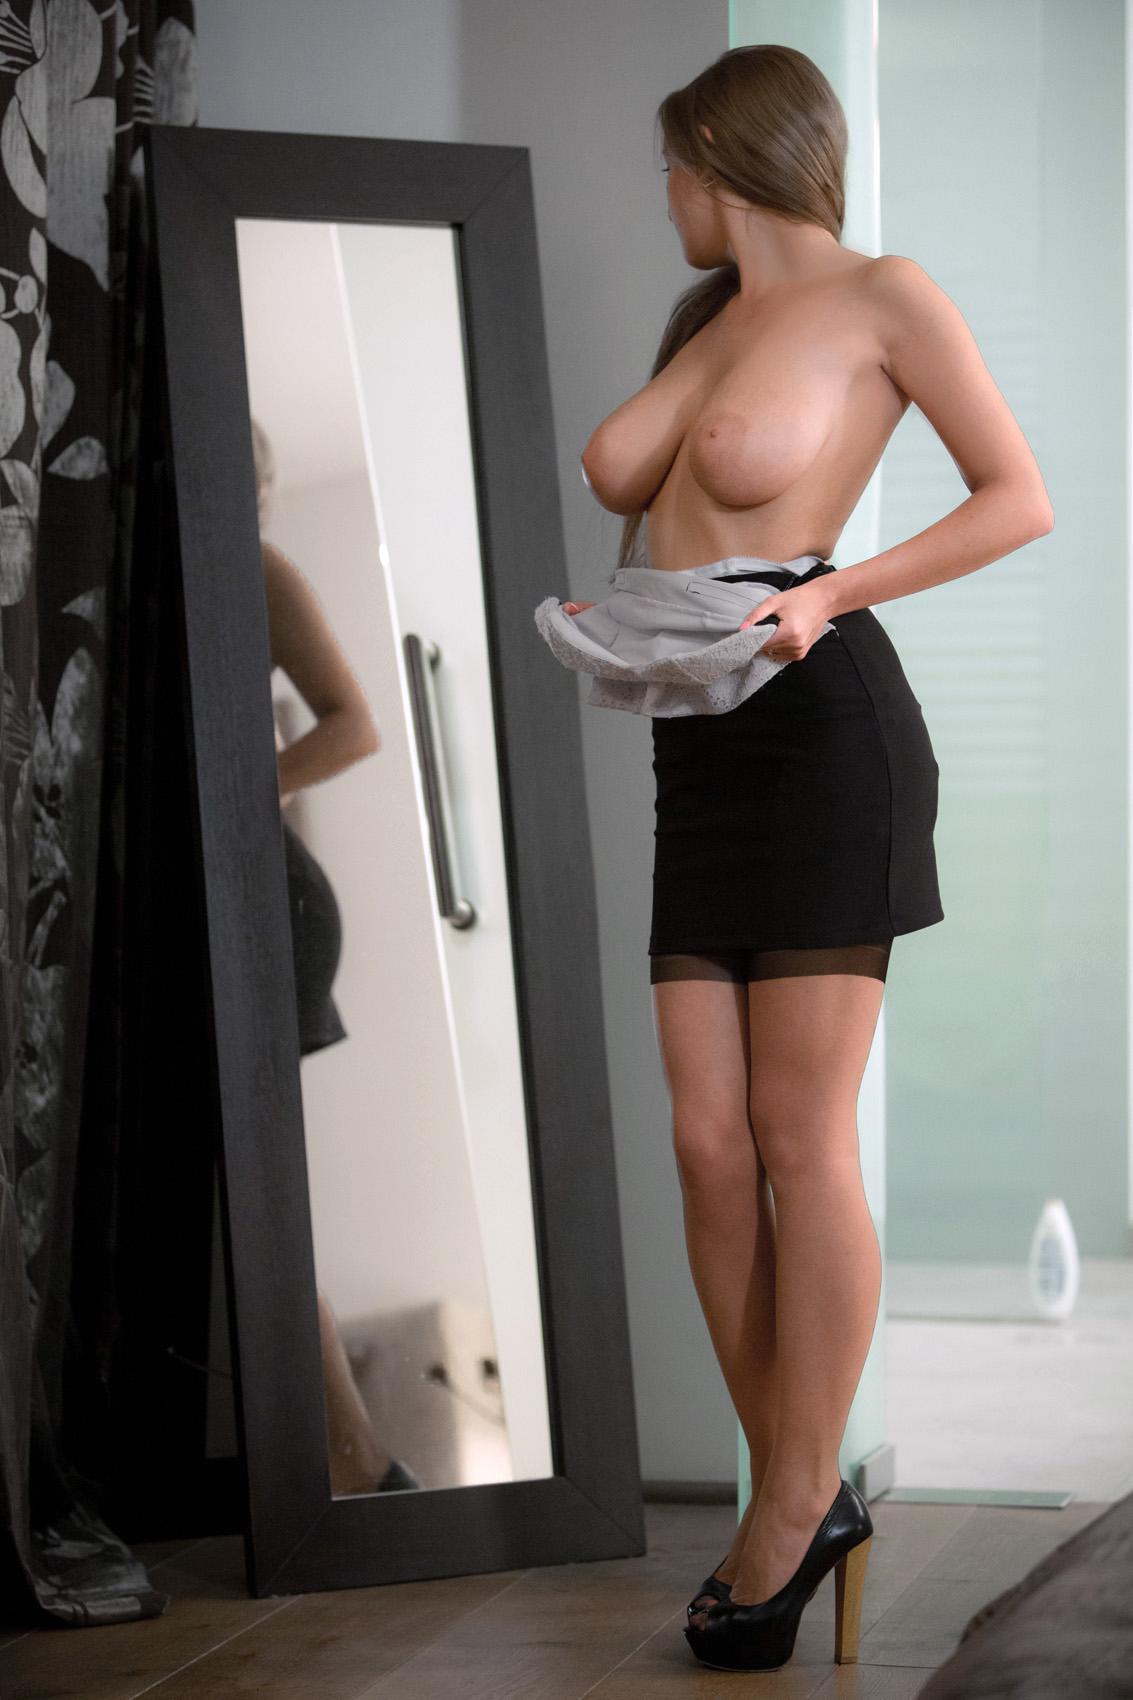 huge-boobs-tits-naked-mix-vol5-63